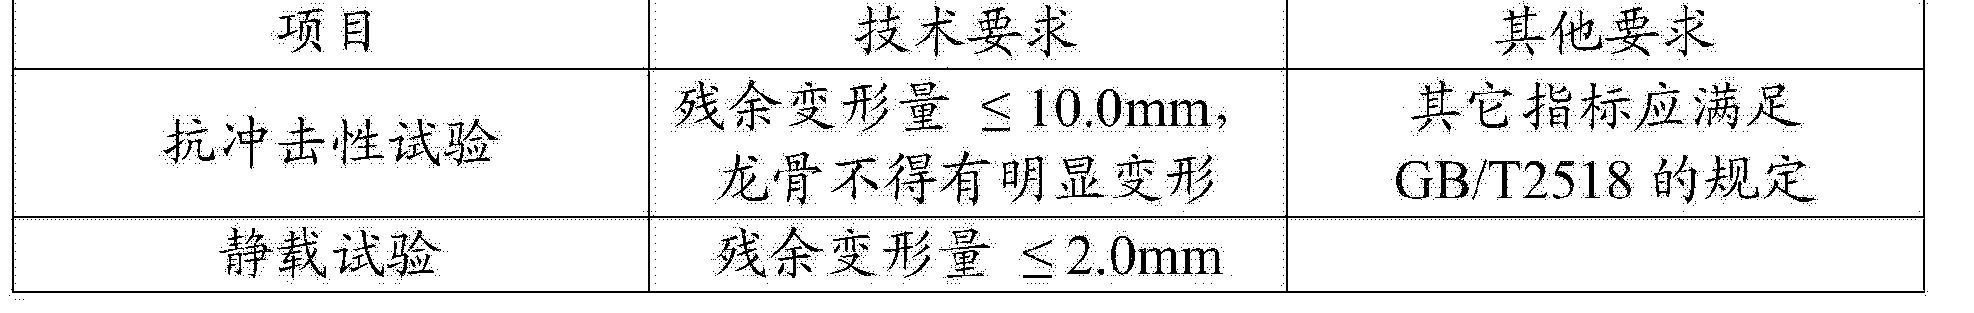 Figure CN204571010UD00061